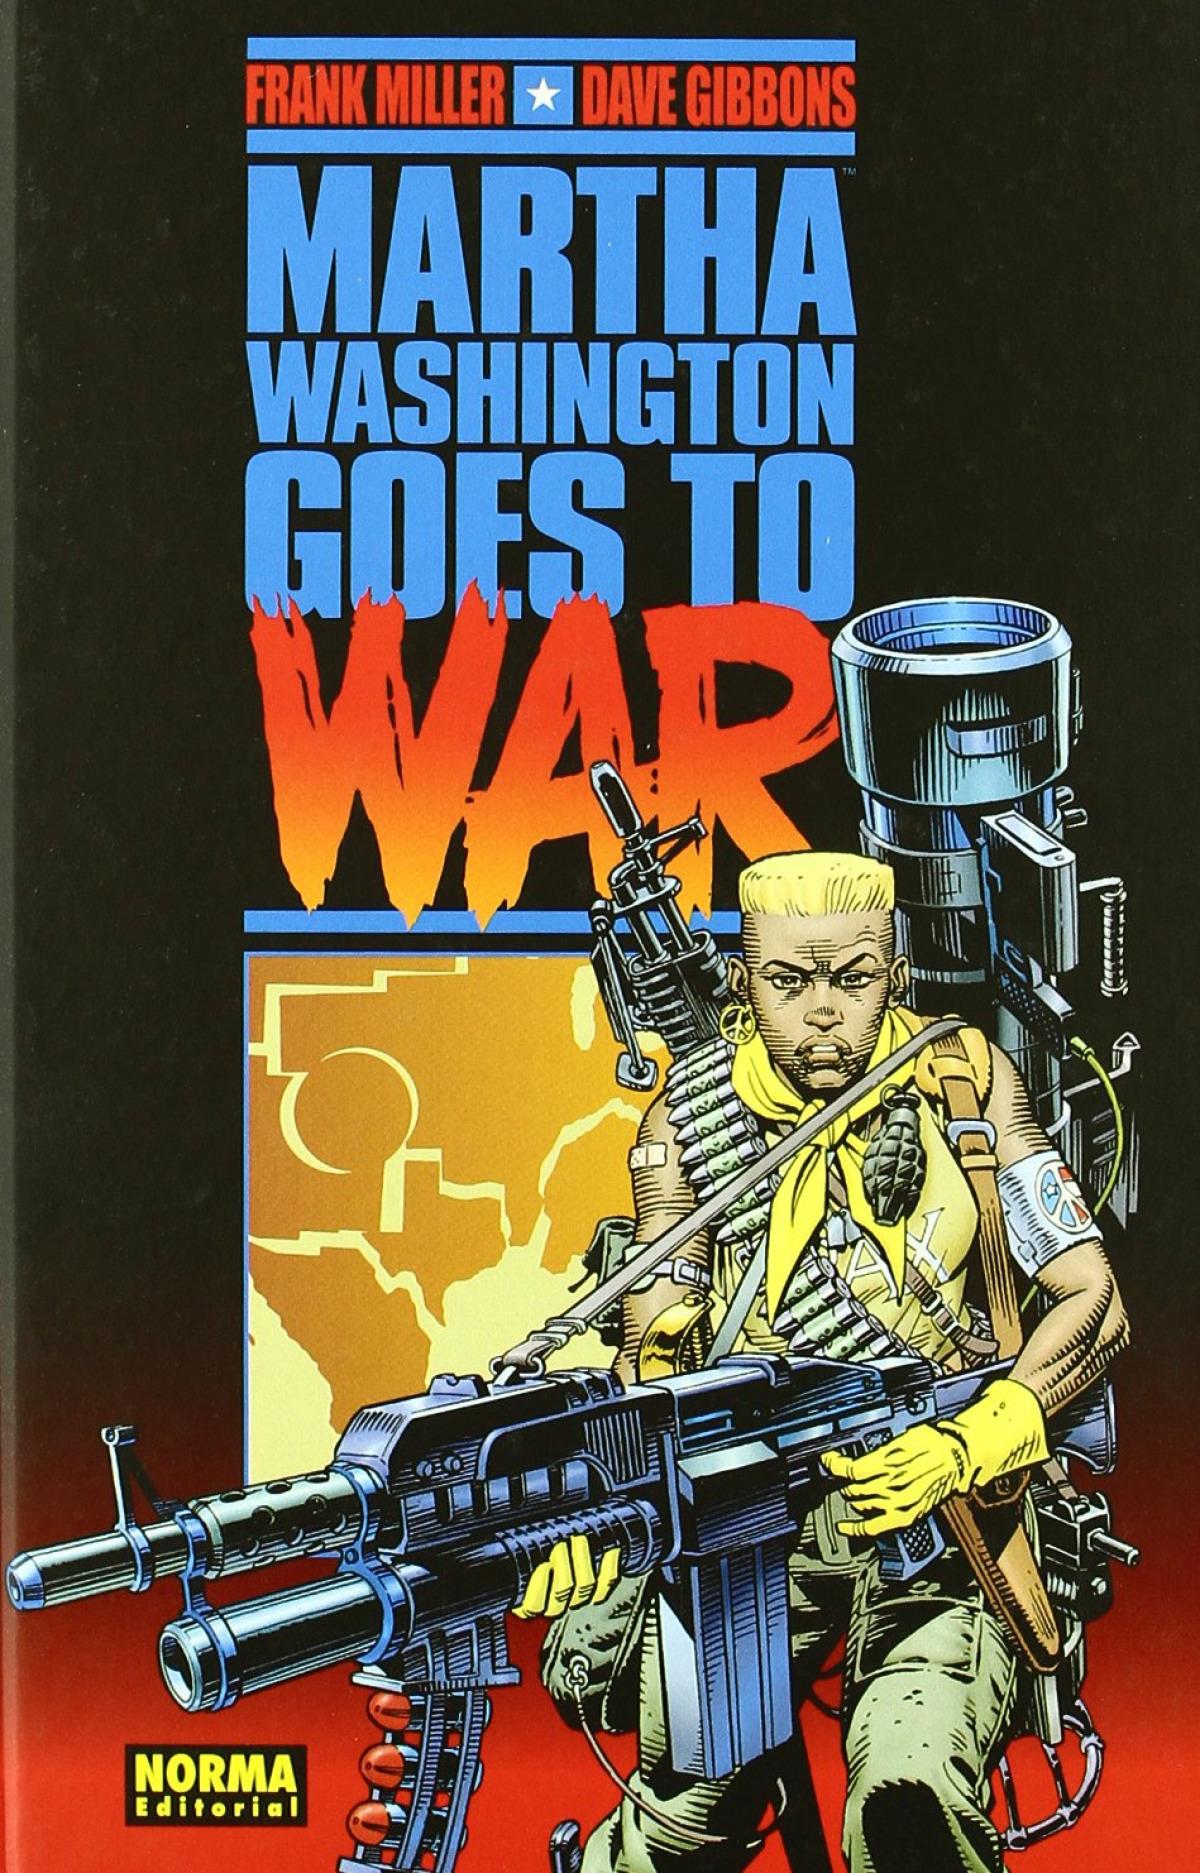 Martha Washington Goes To War